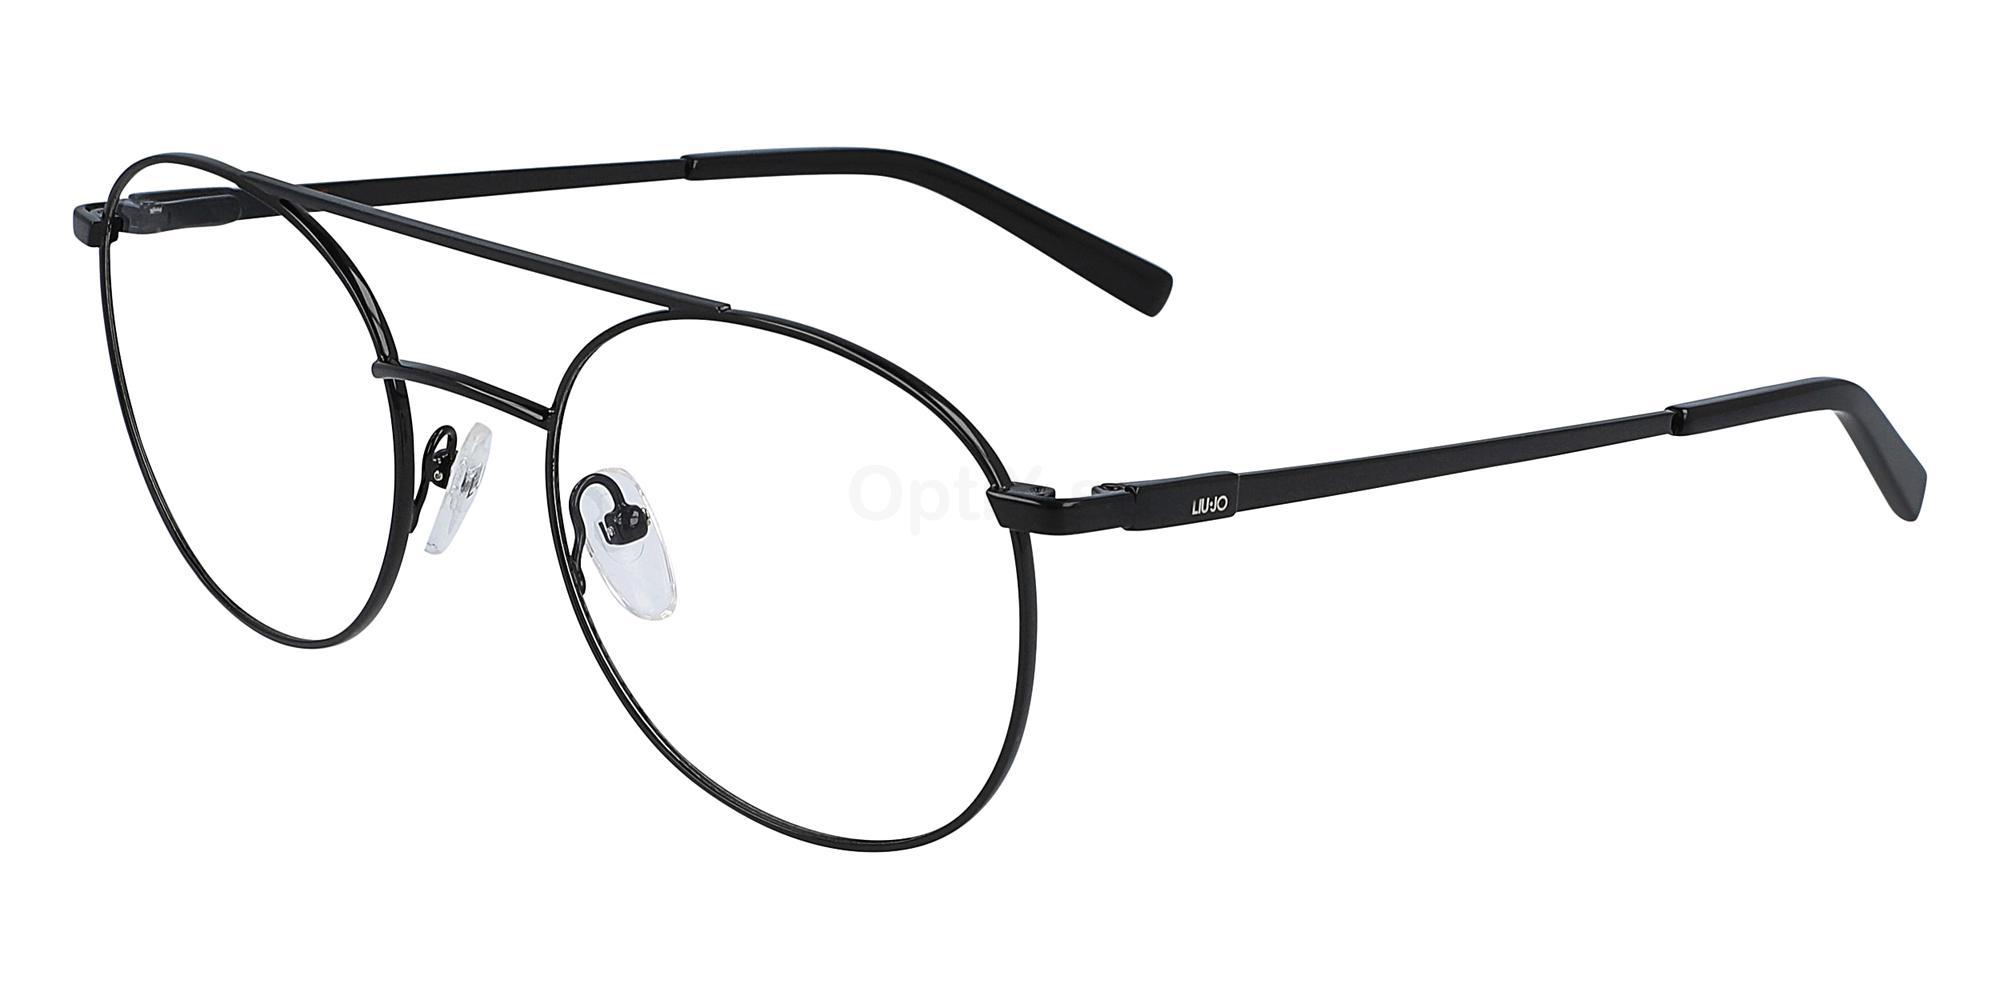 001 LJ2139 Glasses, Liu Jo